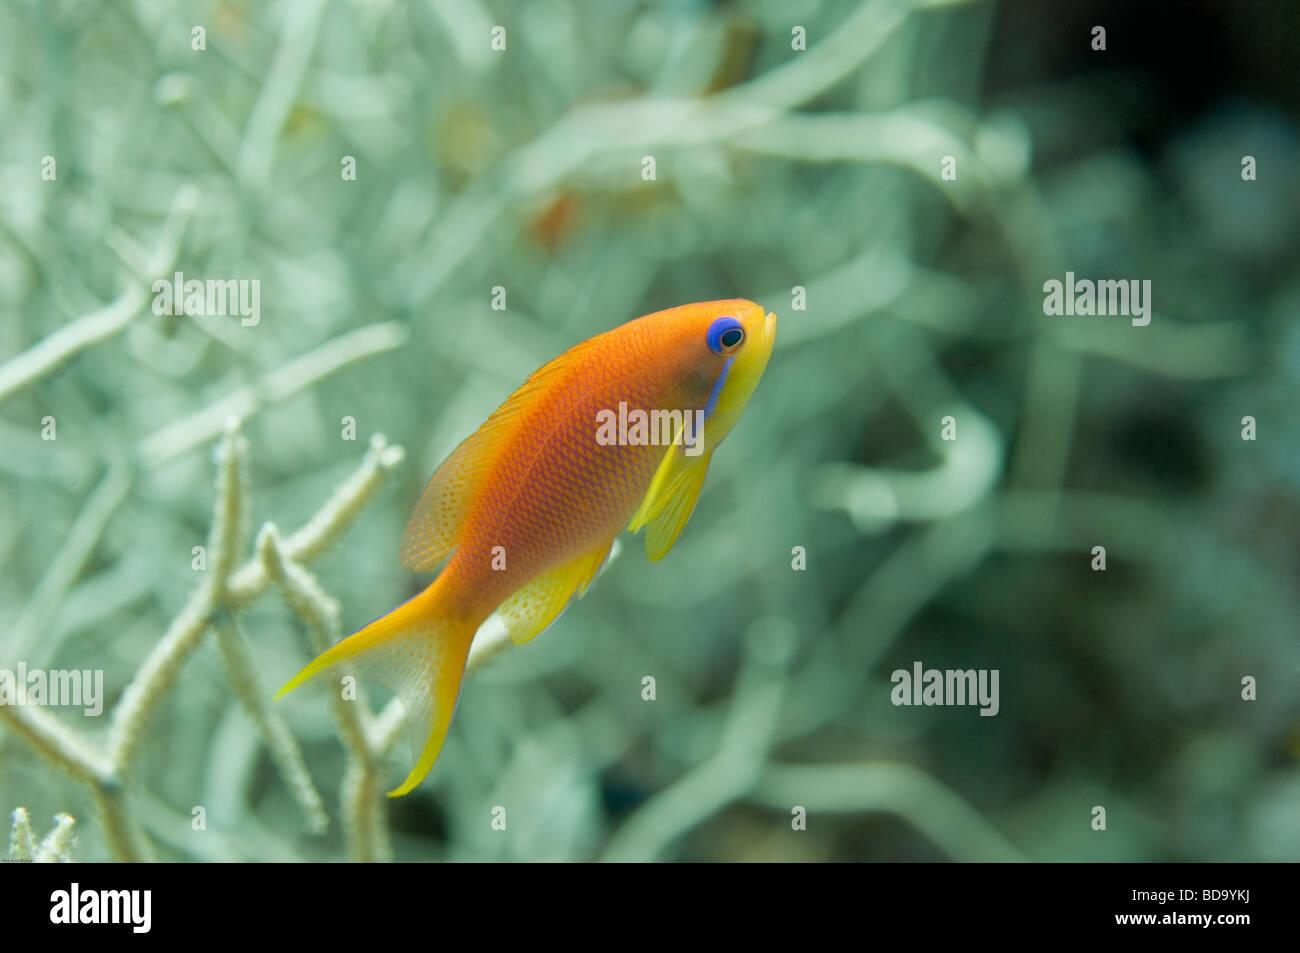 Profile view of an Anthias fish. - Stock Image